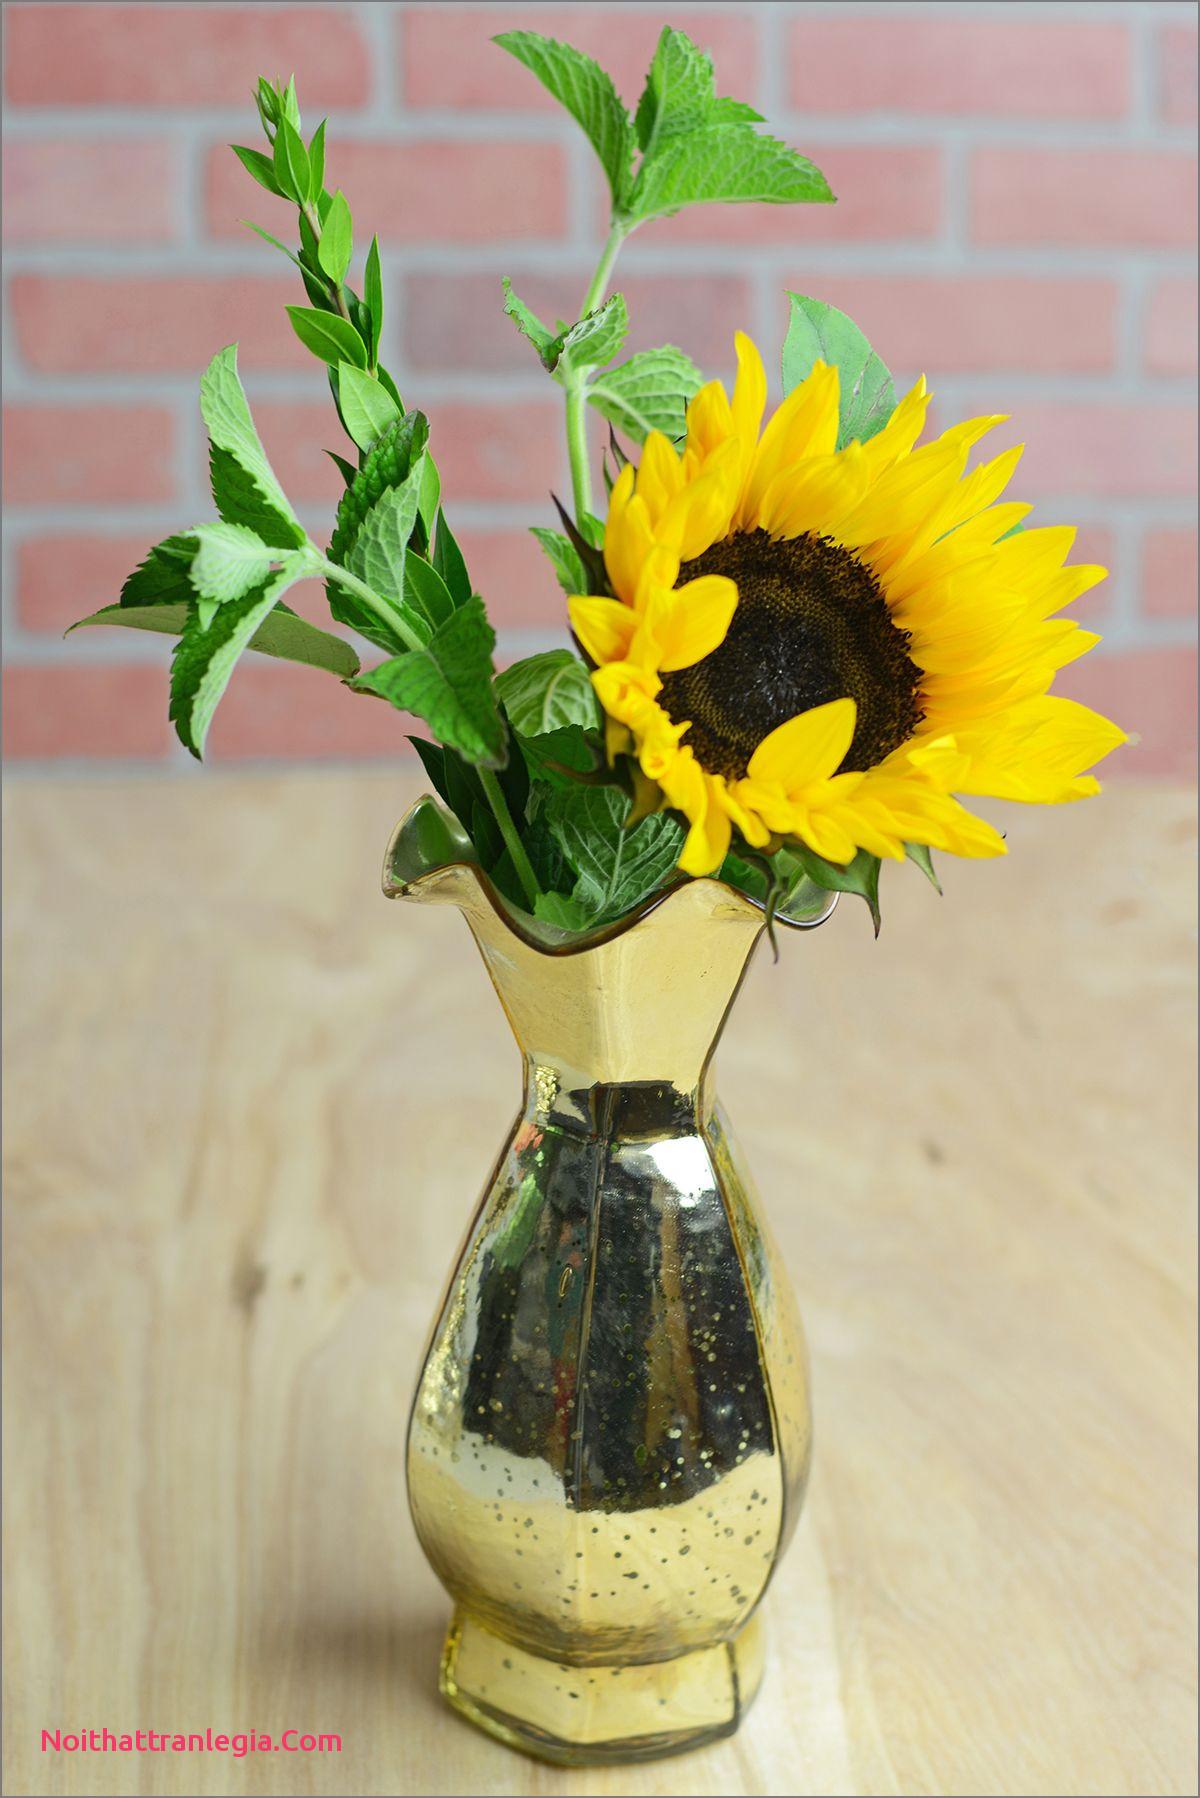 Large Silver Mosaic Vase Of 20 How to Make Mercury Glass Vases Noithattranlegia Vases Design Regarding Discount Vases Containers Bowls Save On Crafts Tall Glass Vaseswedding Lanternsmercury